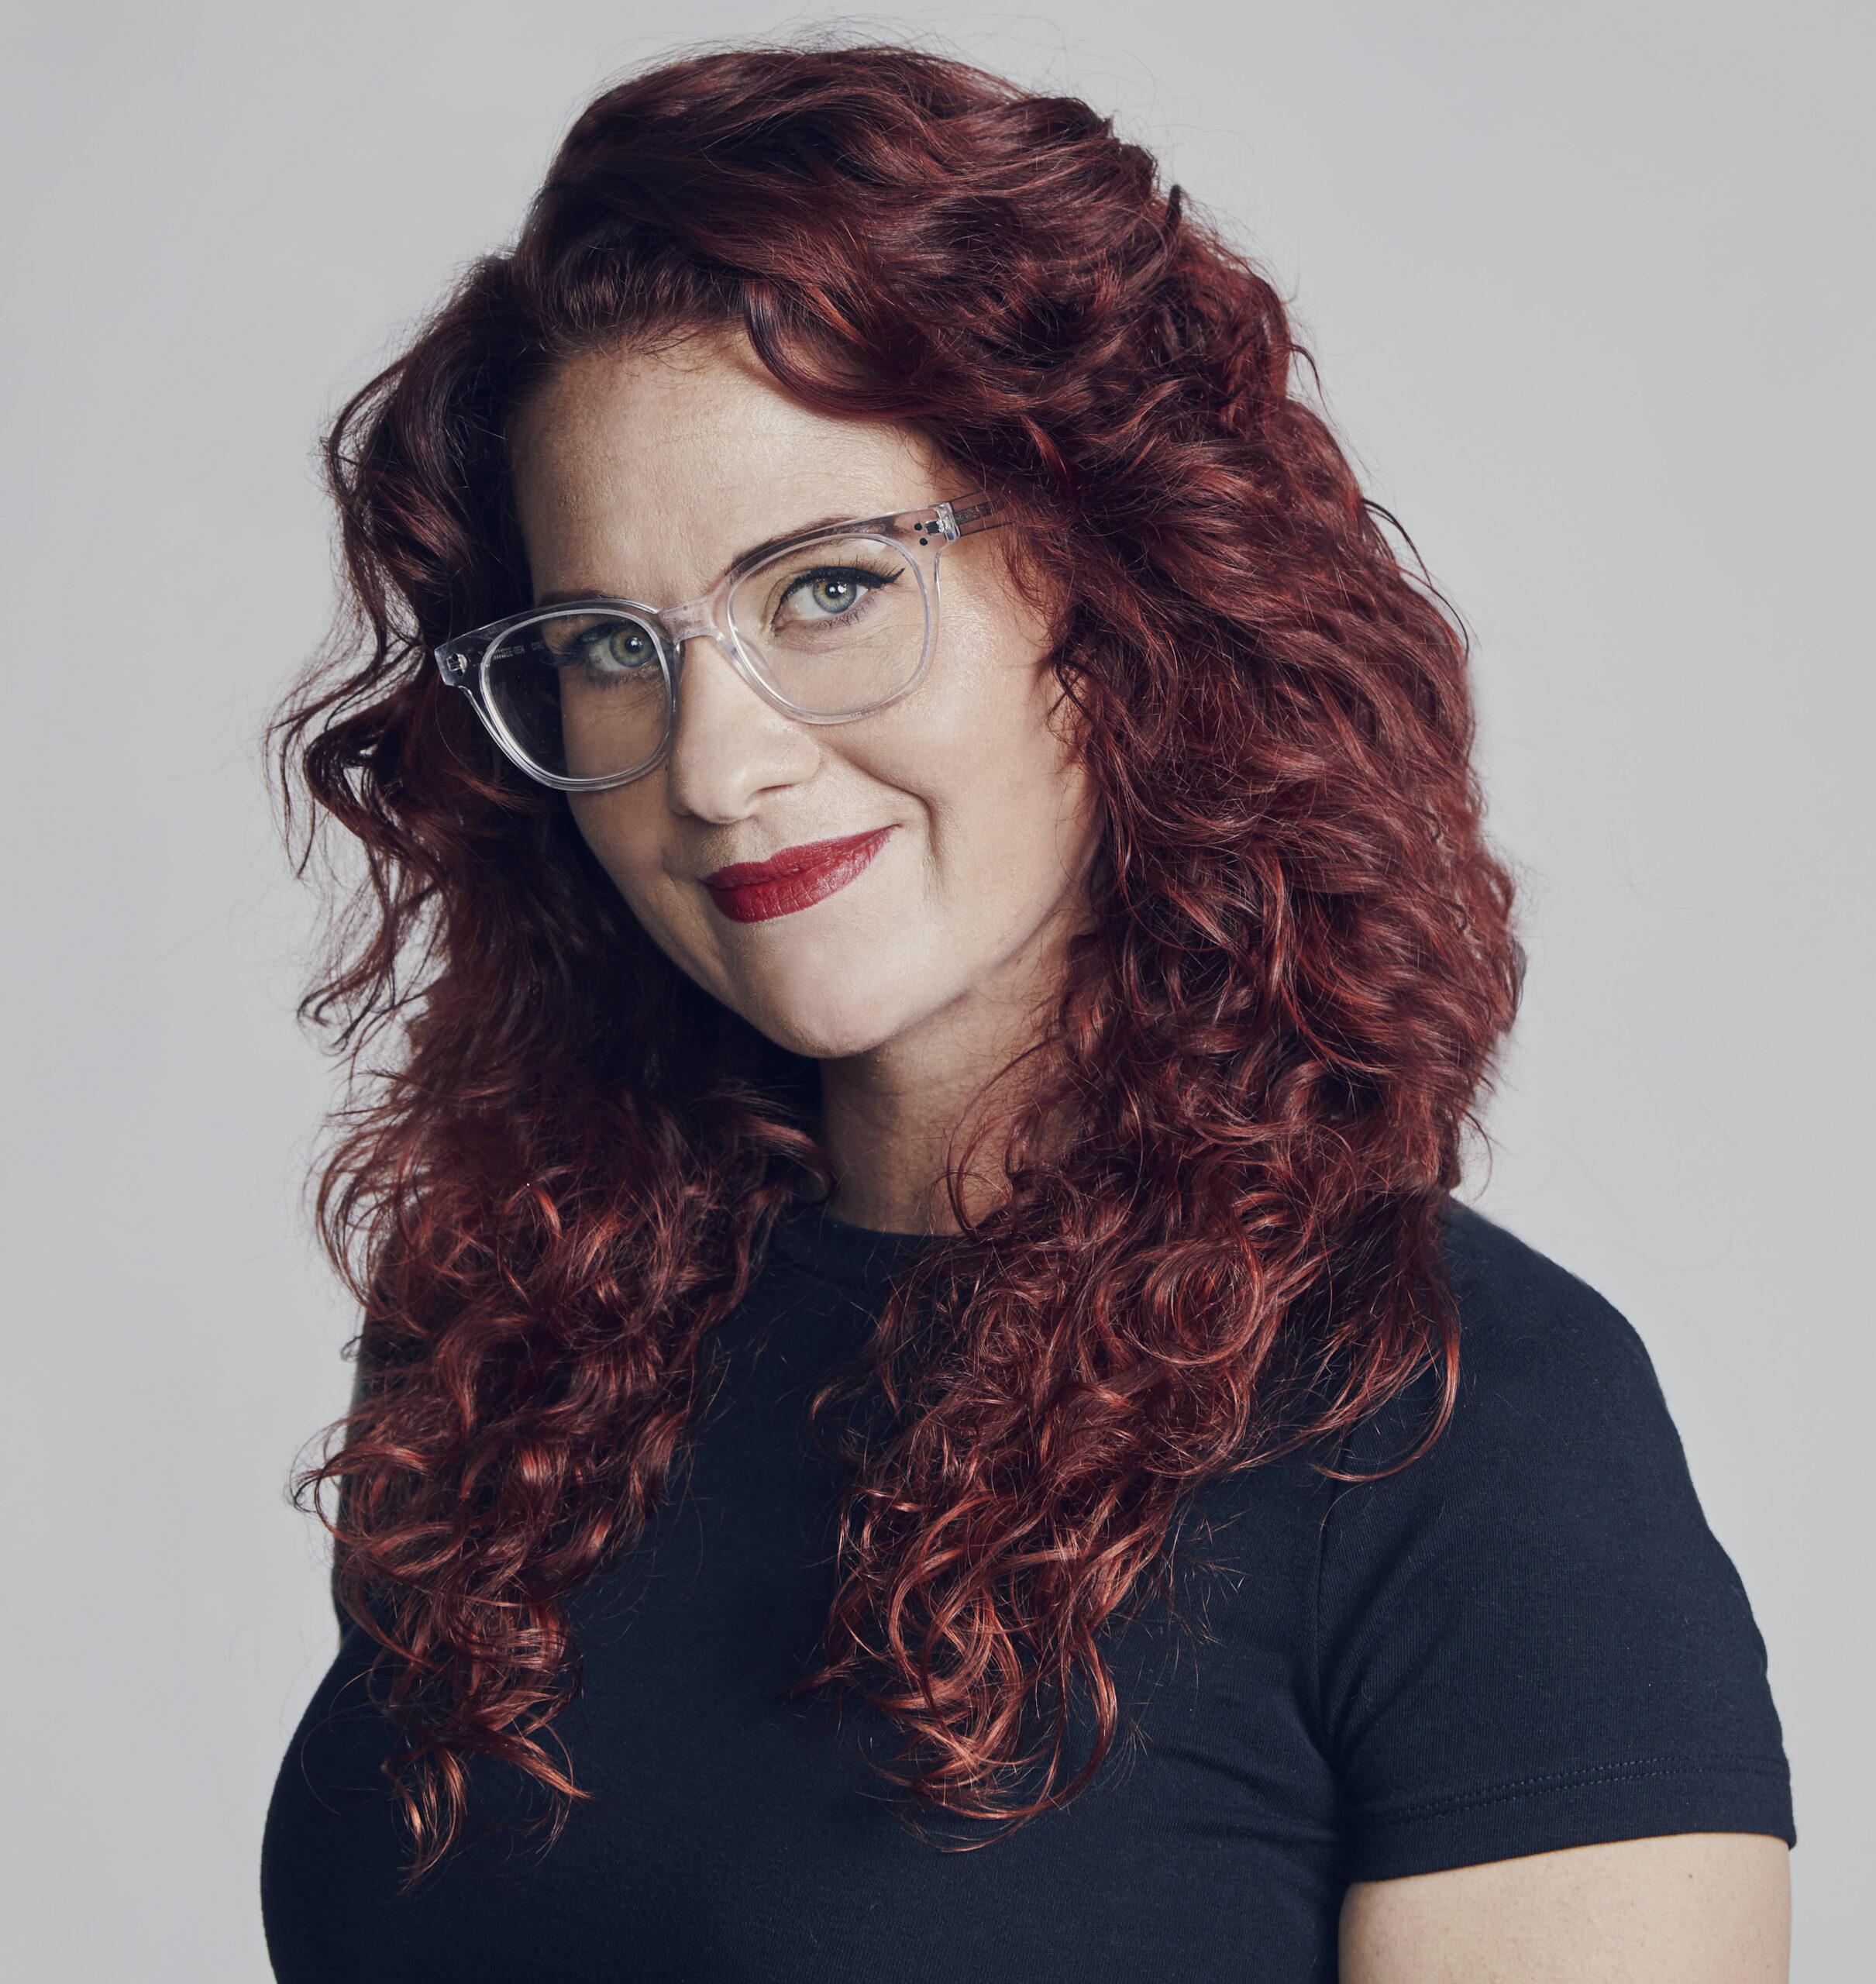 Dr. Tera Jansen - Sex, Your Prescription for Better Mental Health